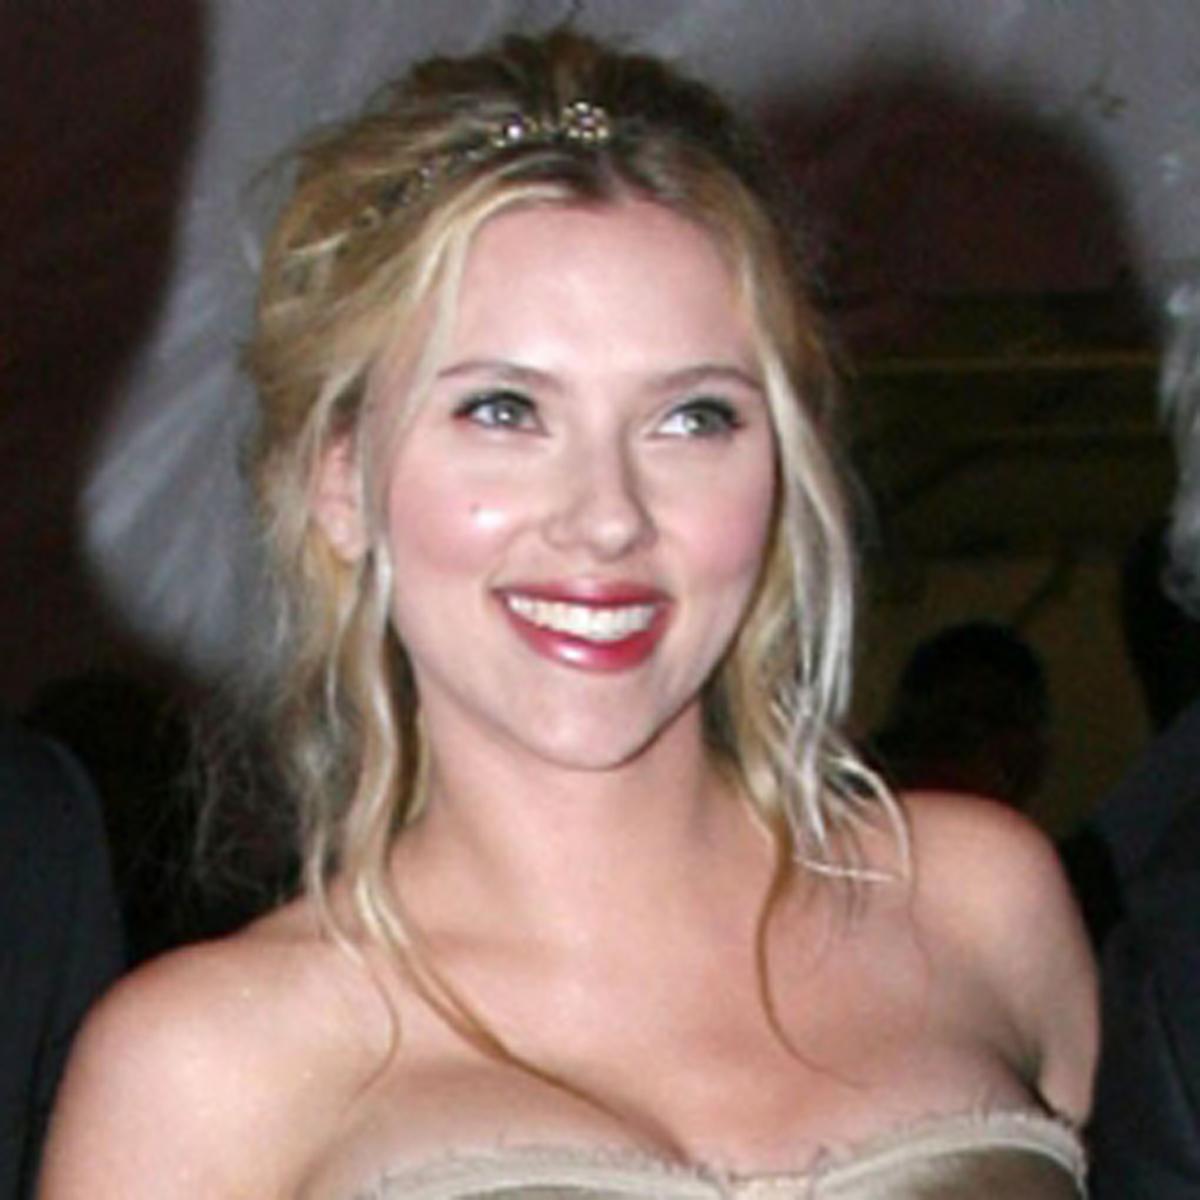 http://3.bp.blogspot.com/-cB4mXrWVFME/Thc6fz3S5FI/AAAAAAAAAjo/CHFR__XLa3o/s1600/Scarlett+Johansson.jpg